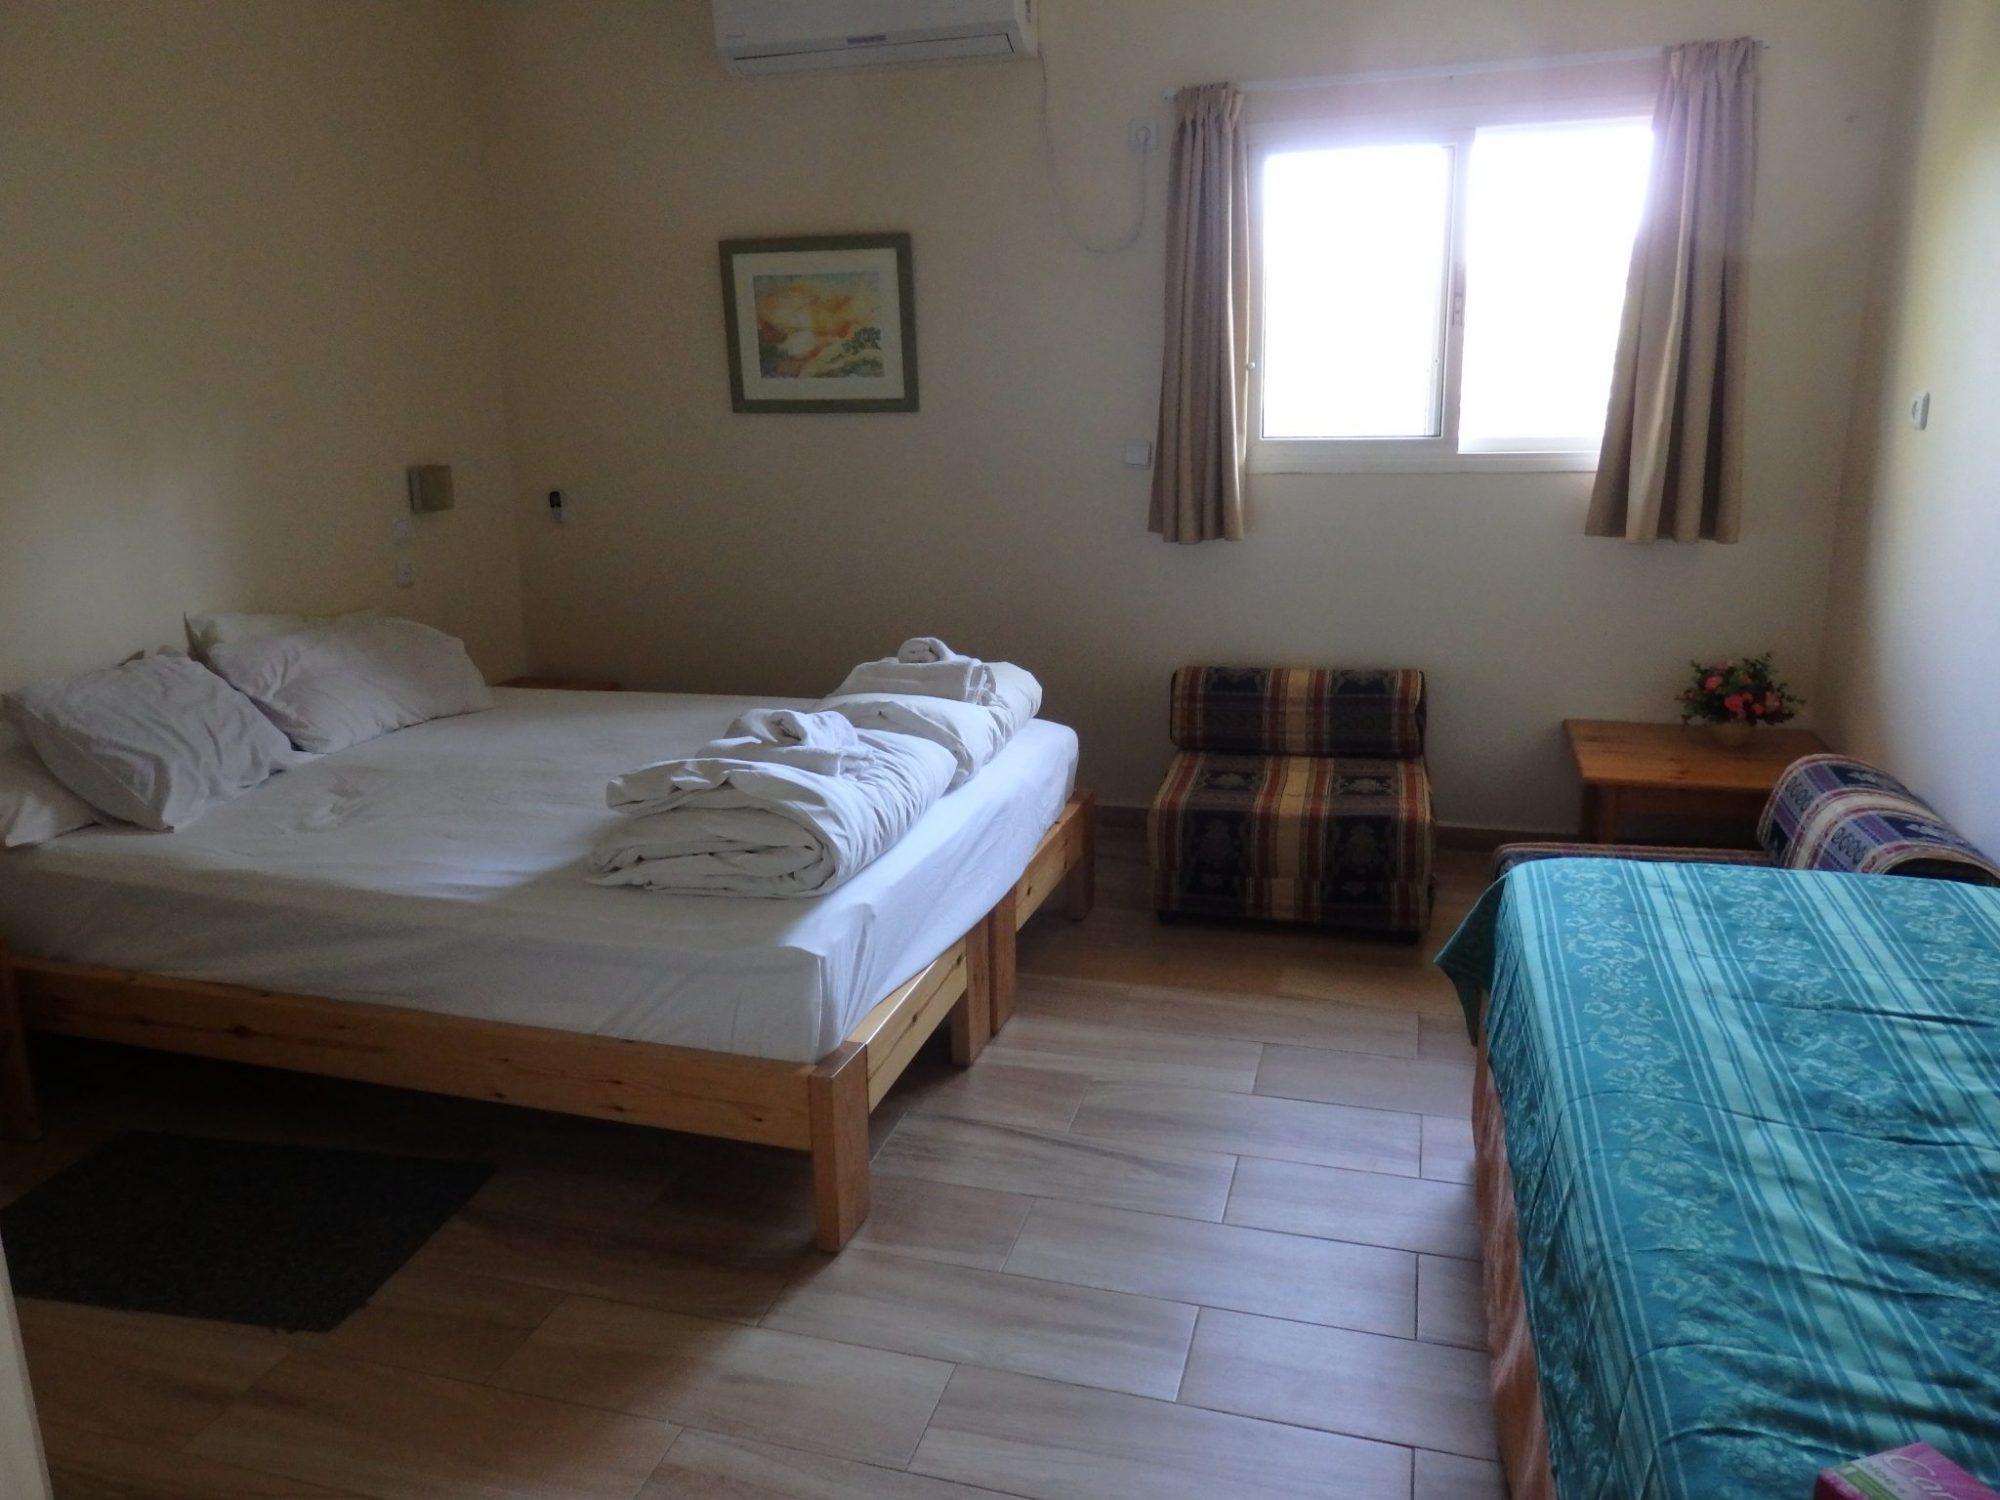 My room at Kibbutz Inbar, one of the ILH hostels in Israel